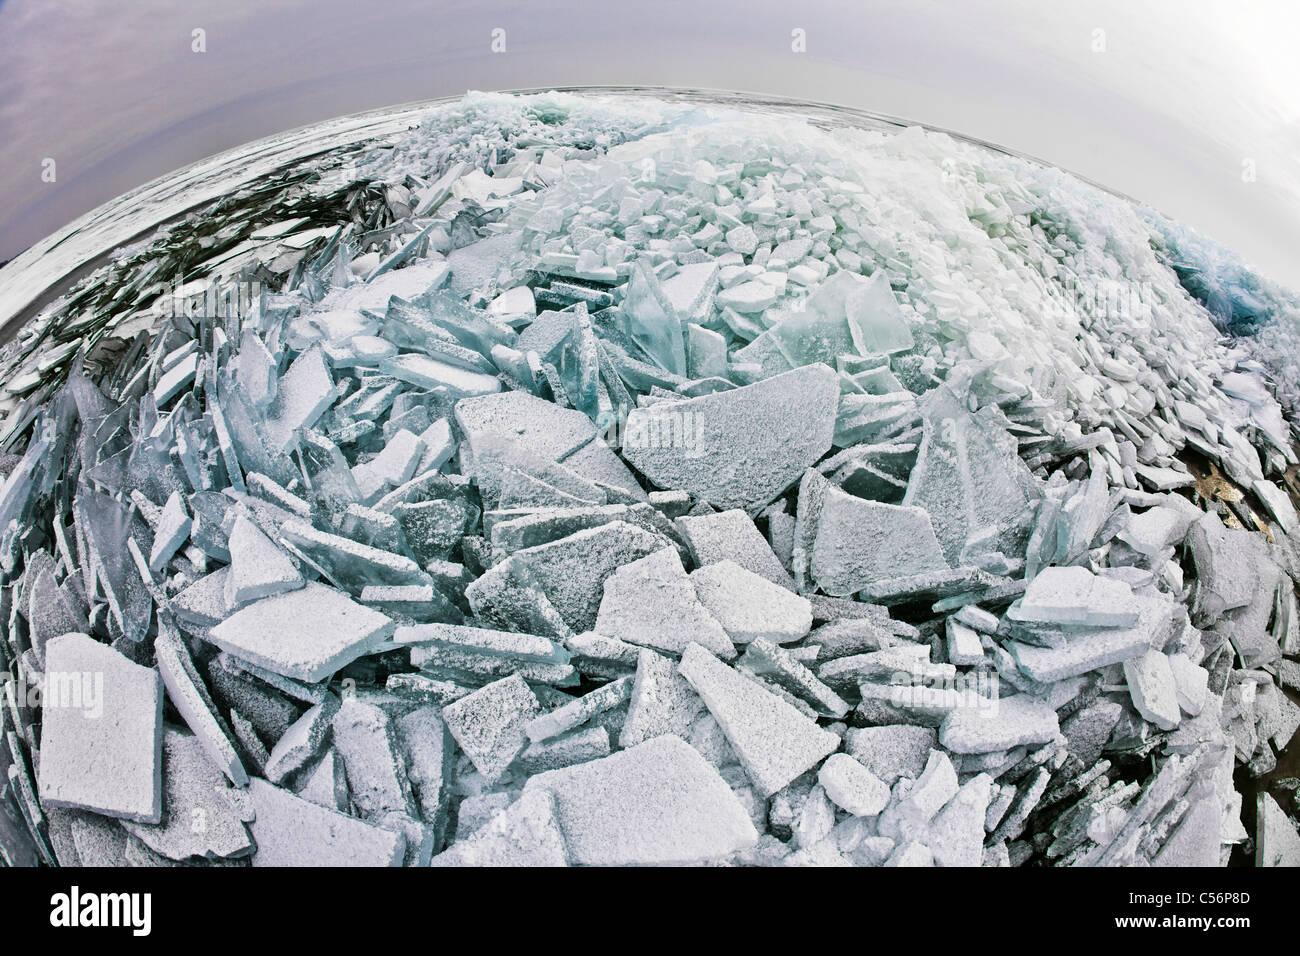 The Netherlands, Oosterleek, Piled up ice on frozen lake called Markermeer. Fisheye lens. - Stock Image